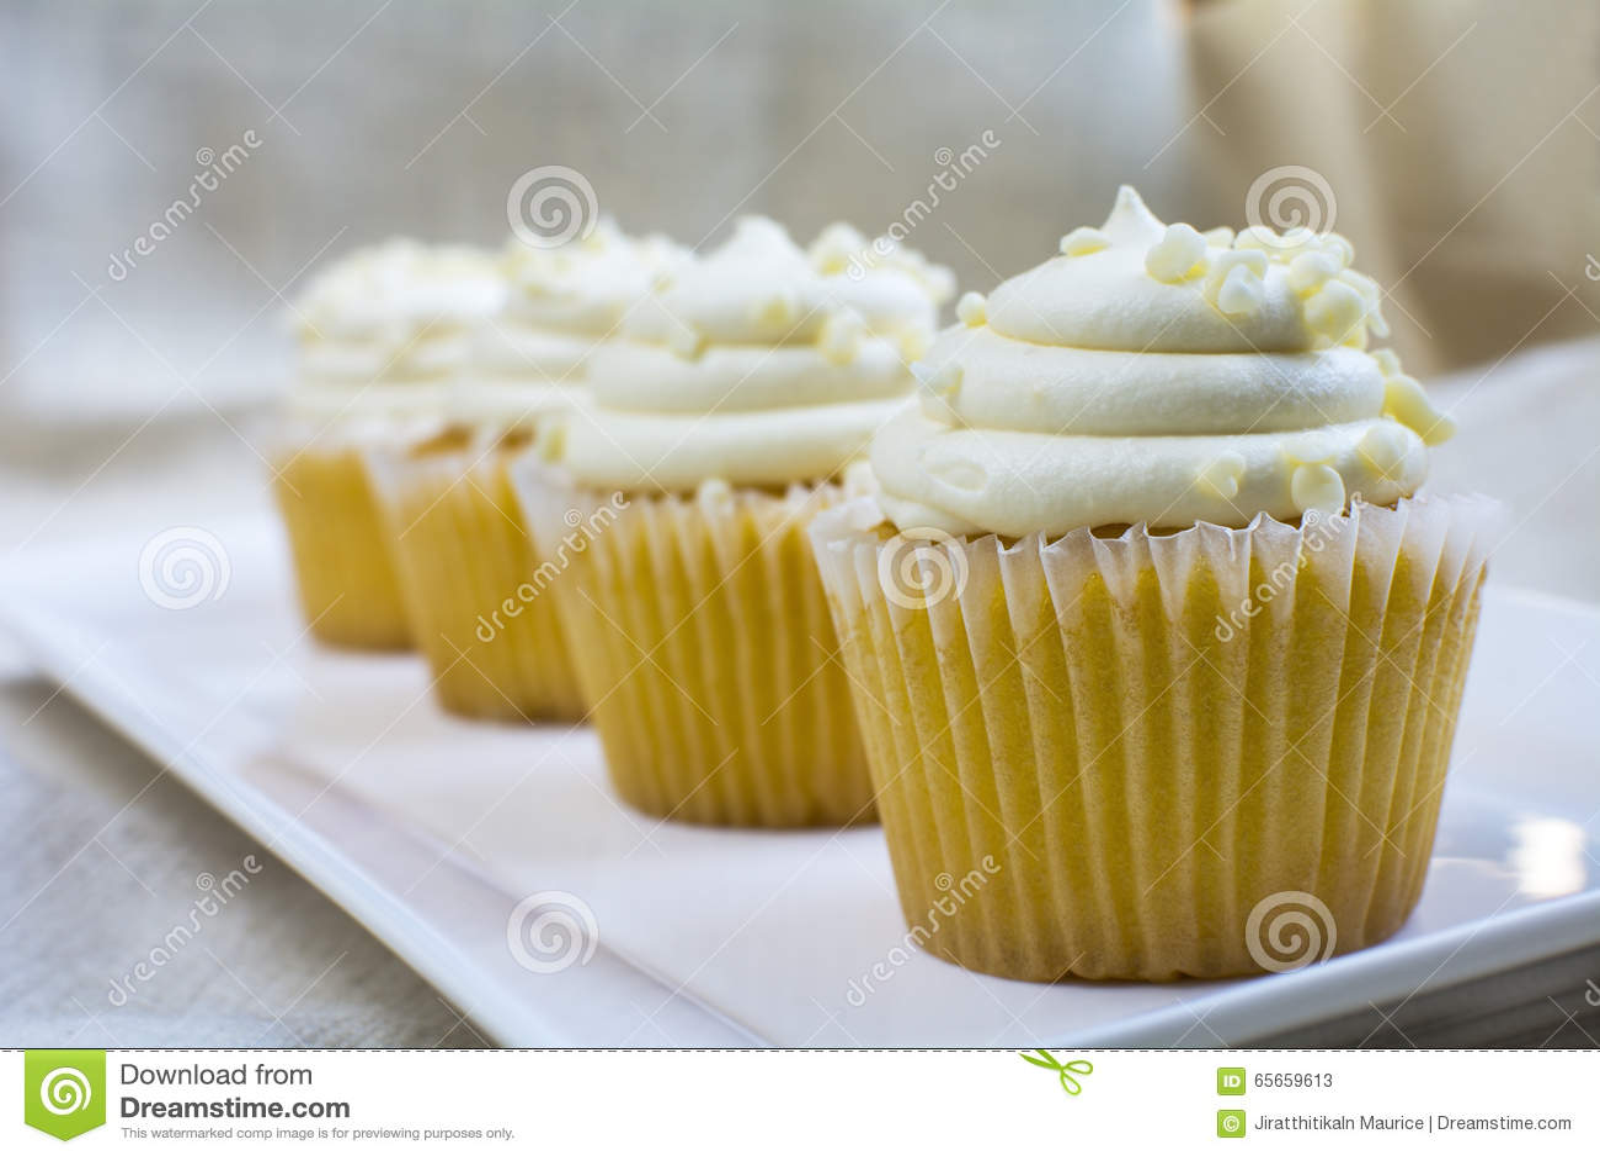 Four French Vanilla Cupcakes Dessert Stock PhotoImage65659613